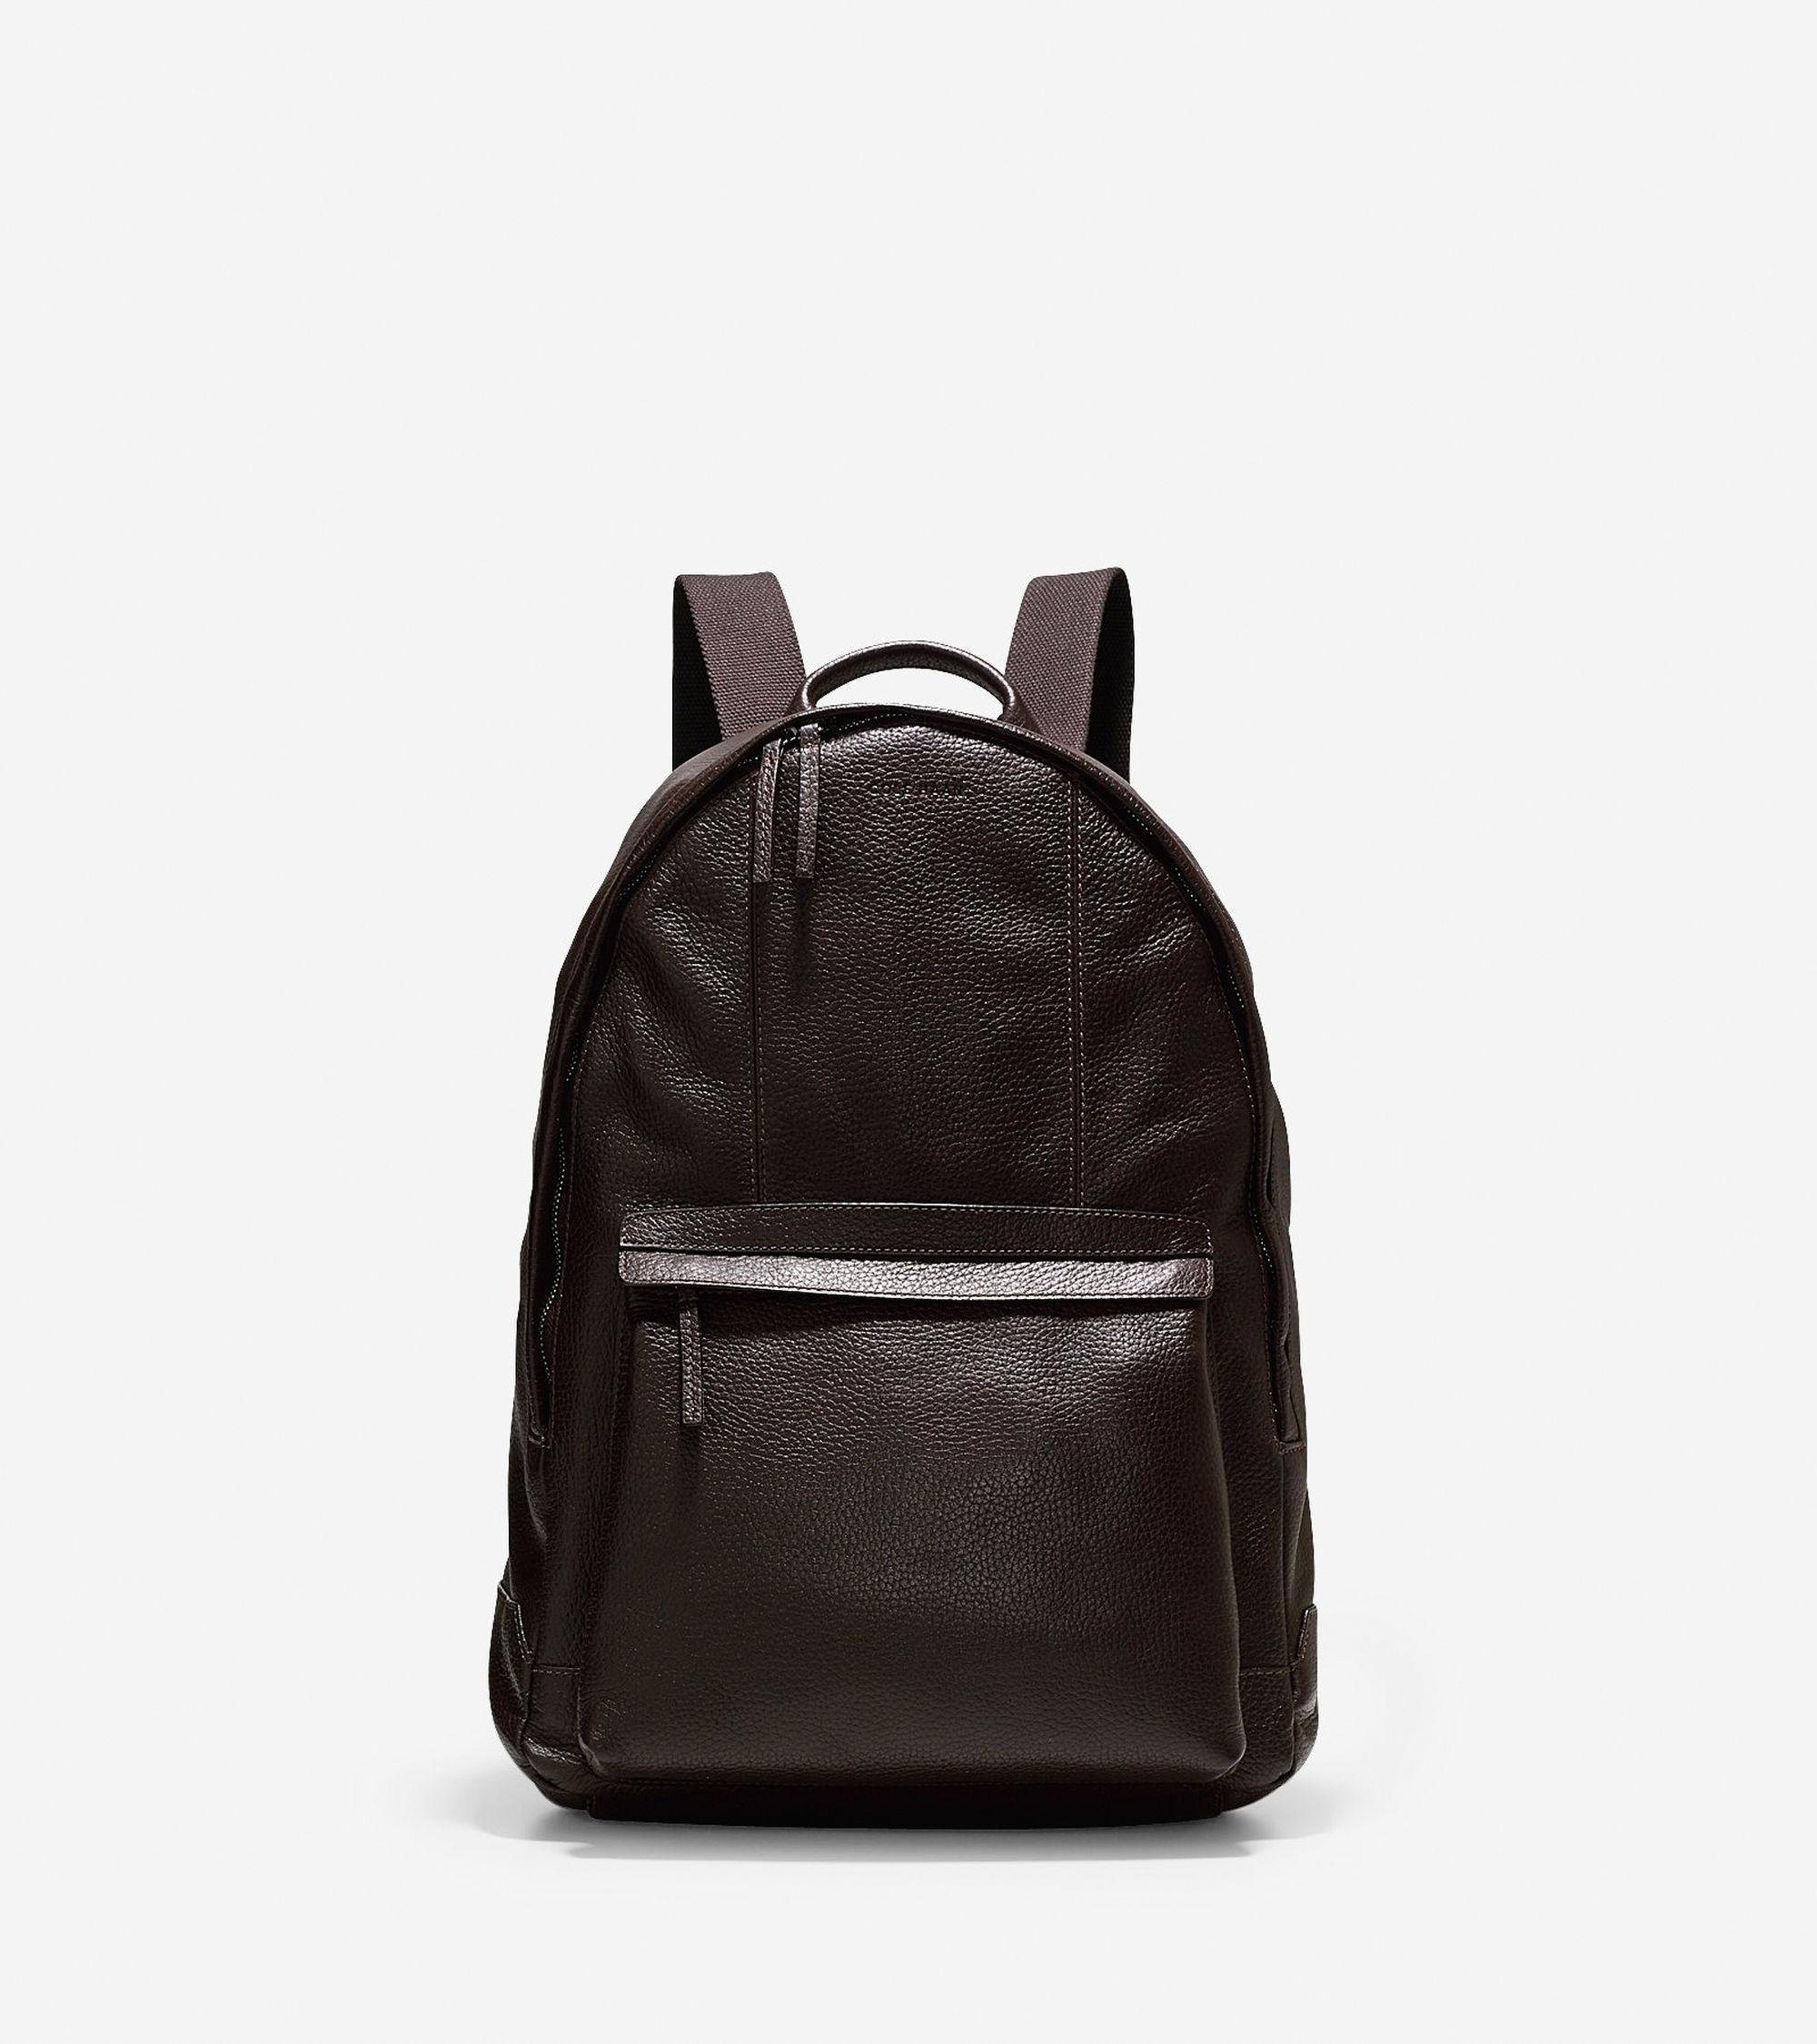 Cole haan Wayland Backpack in Brown